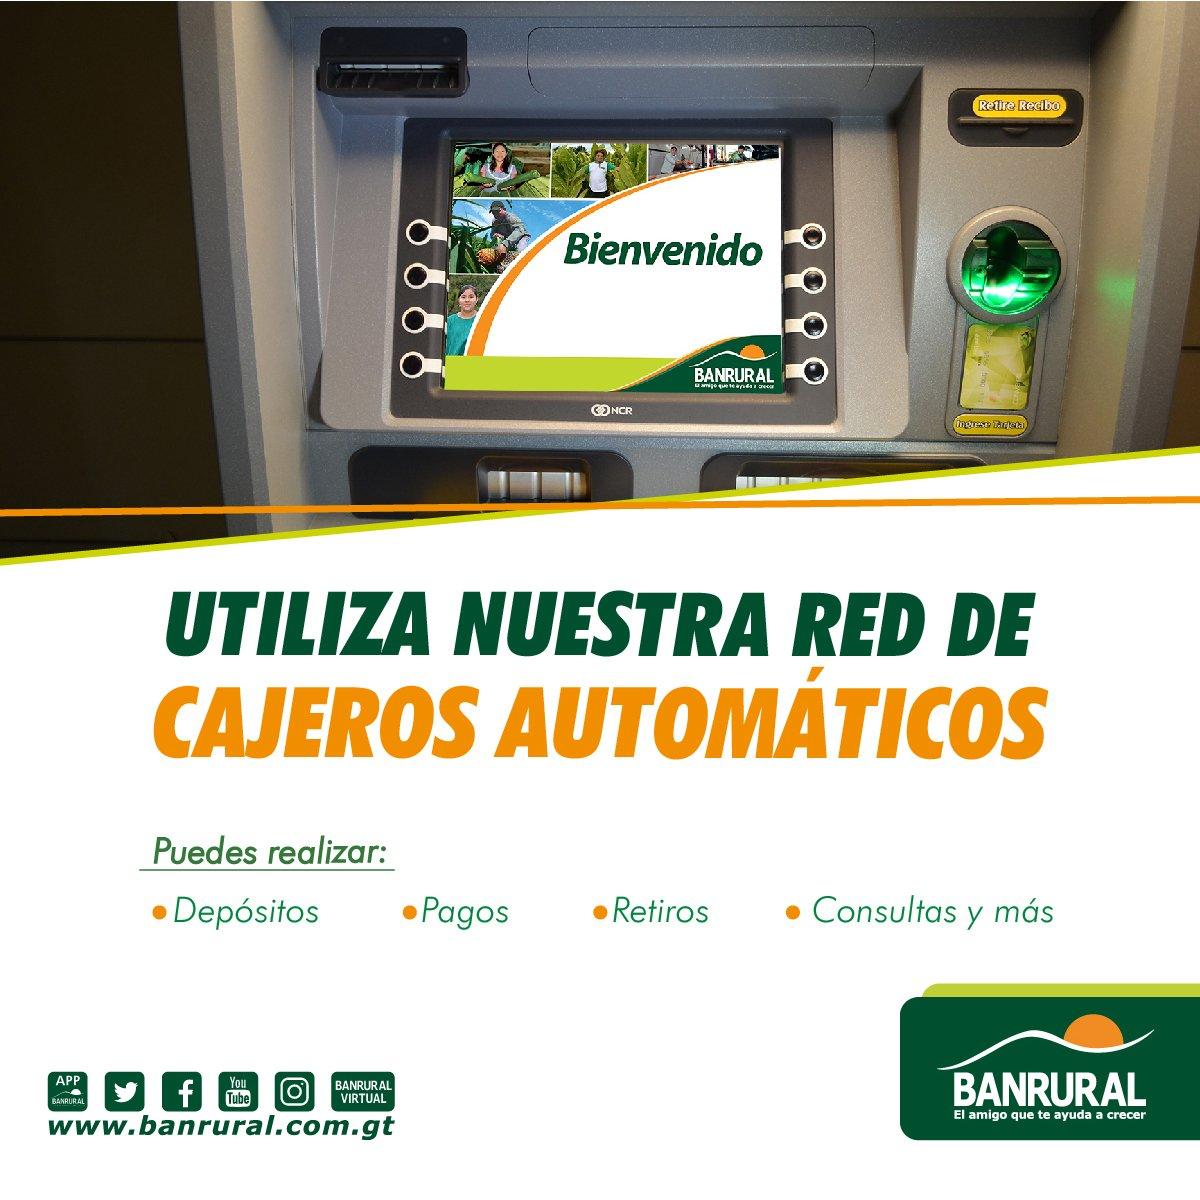 banrural guatemala on twitter nuestra red de cajeros